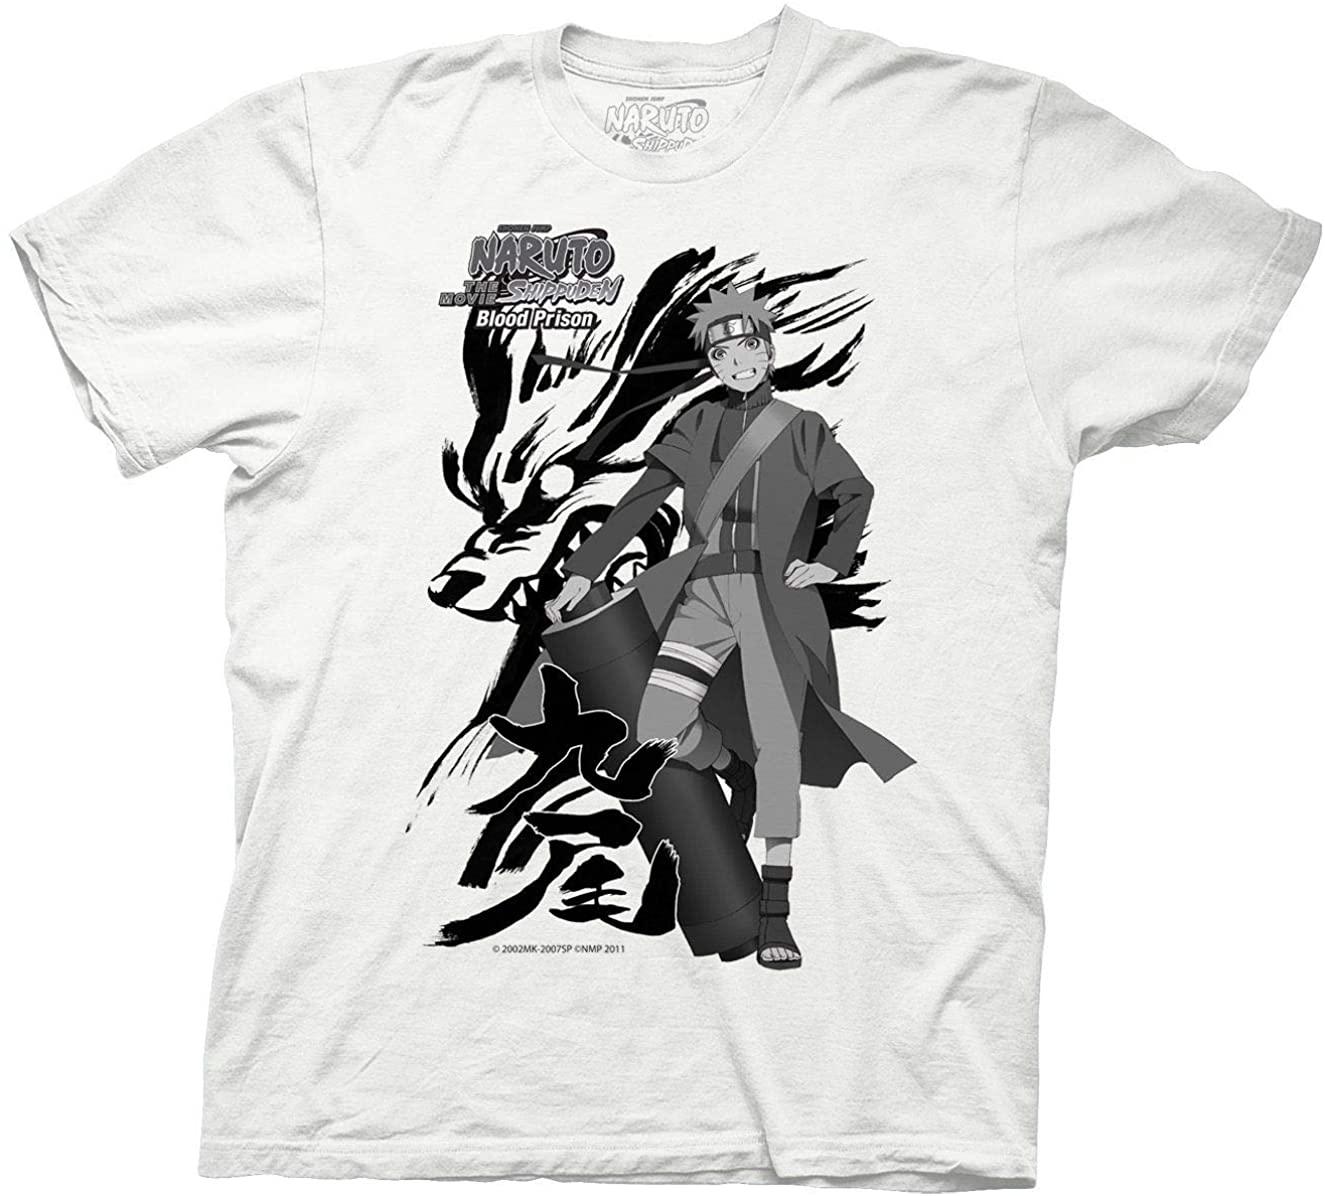 Ripple Junction Naruto Shippuden Adult Unisex Blood Prison Light Weight 100% Cotton Crew T-Shirt